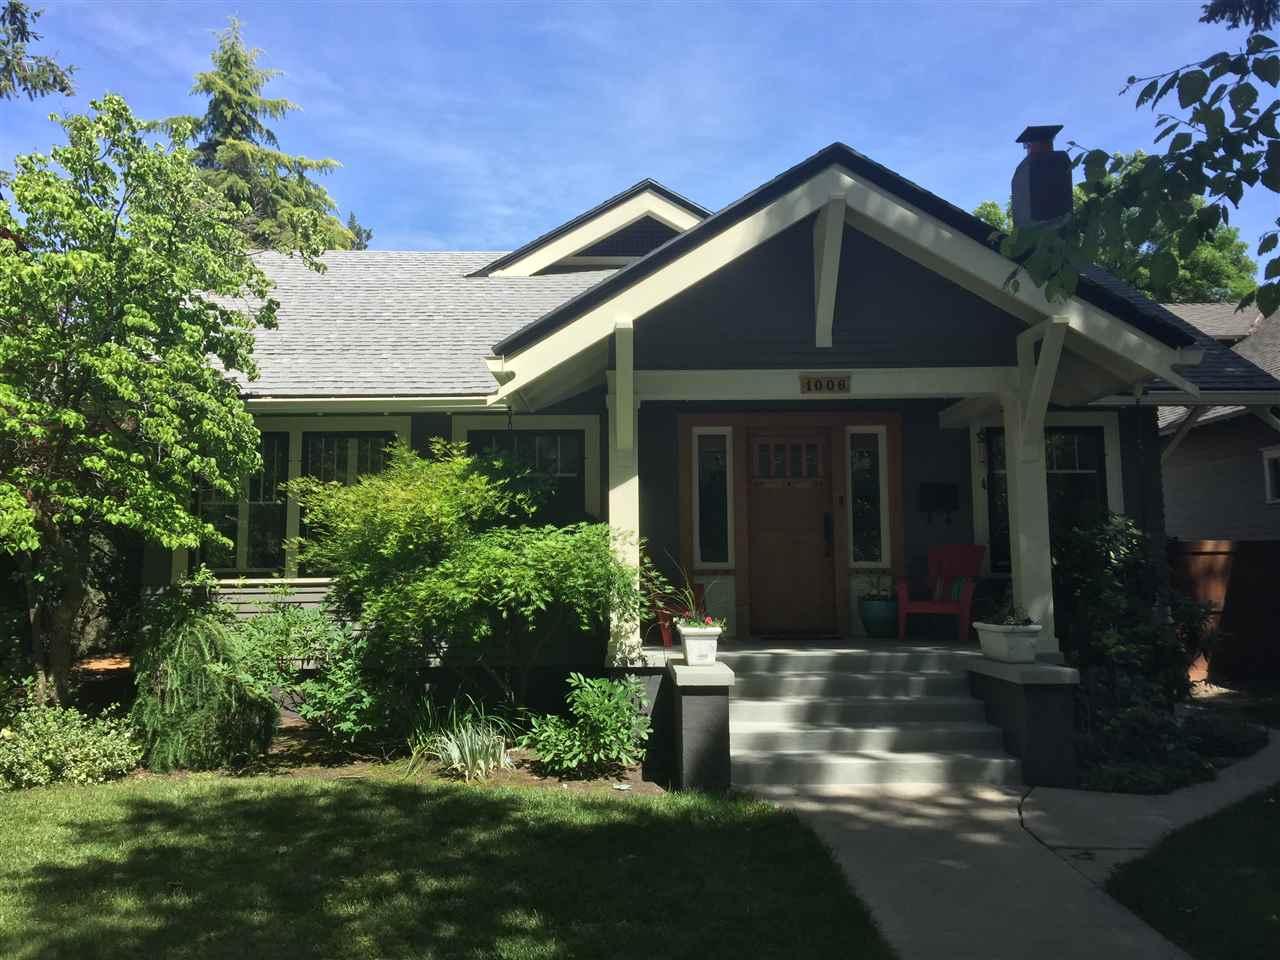 1006 N 17th Street, Boise, ID 83702